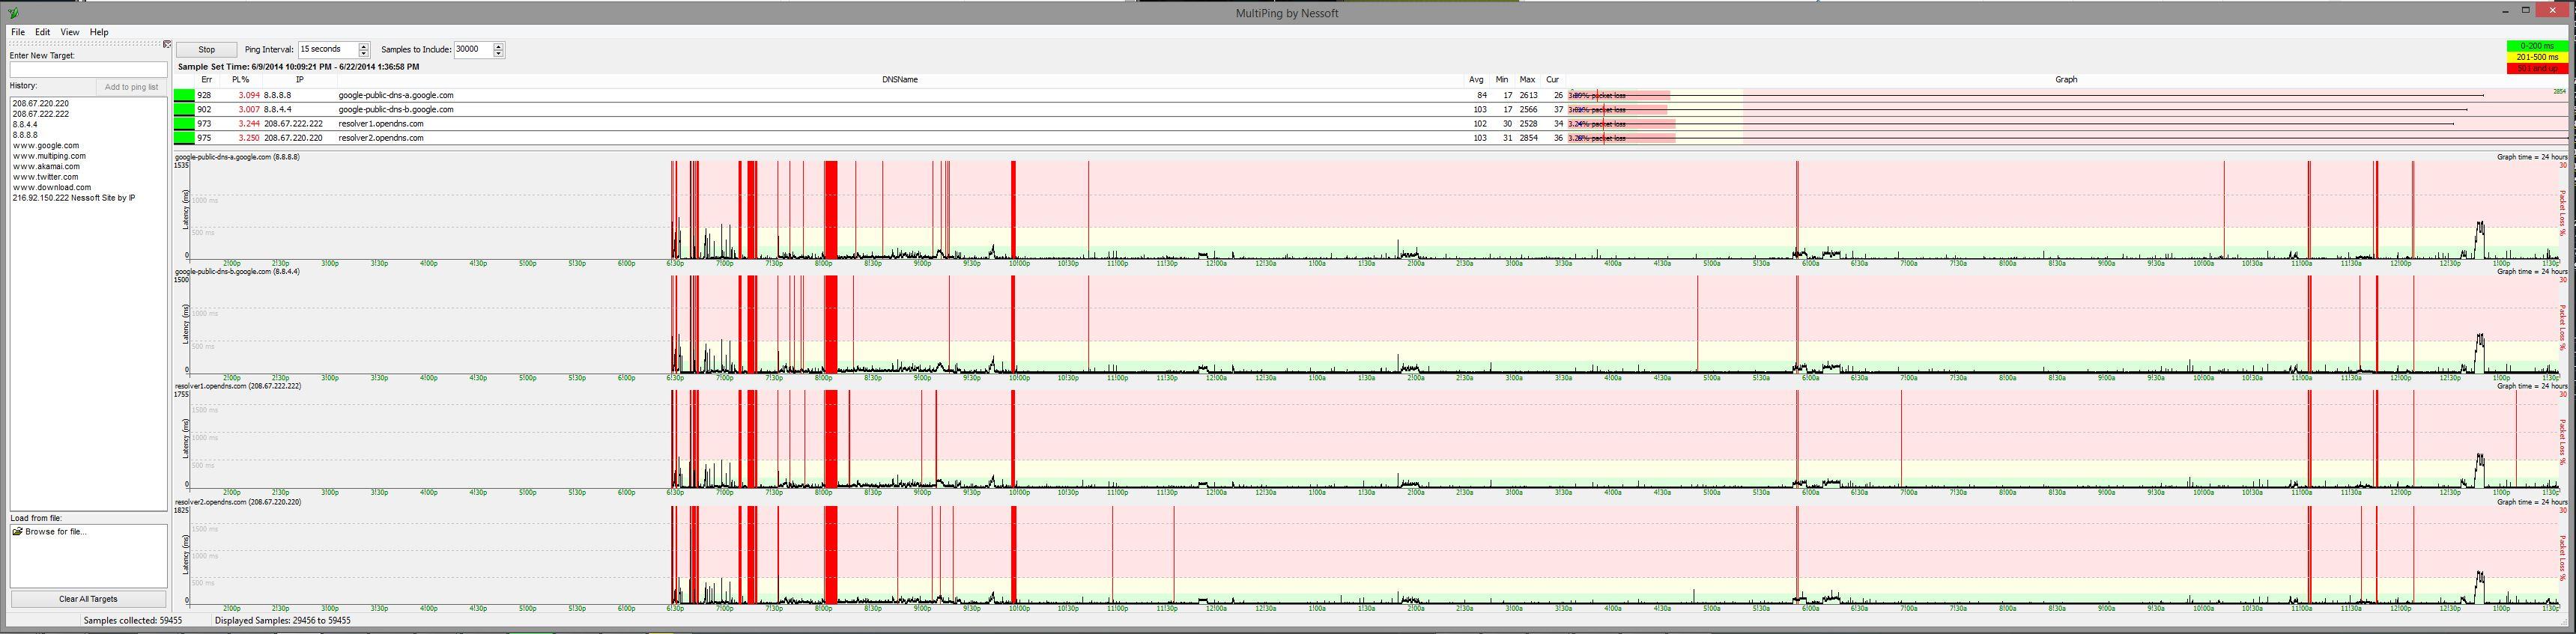 Comcast-Multiping 1.JPG